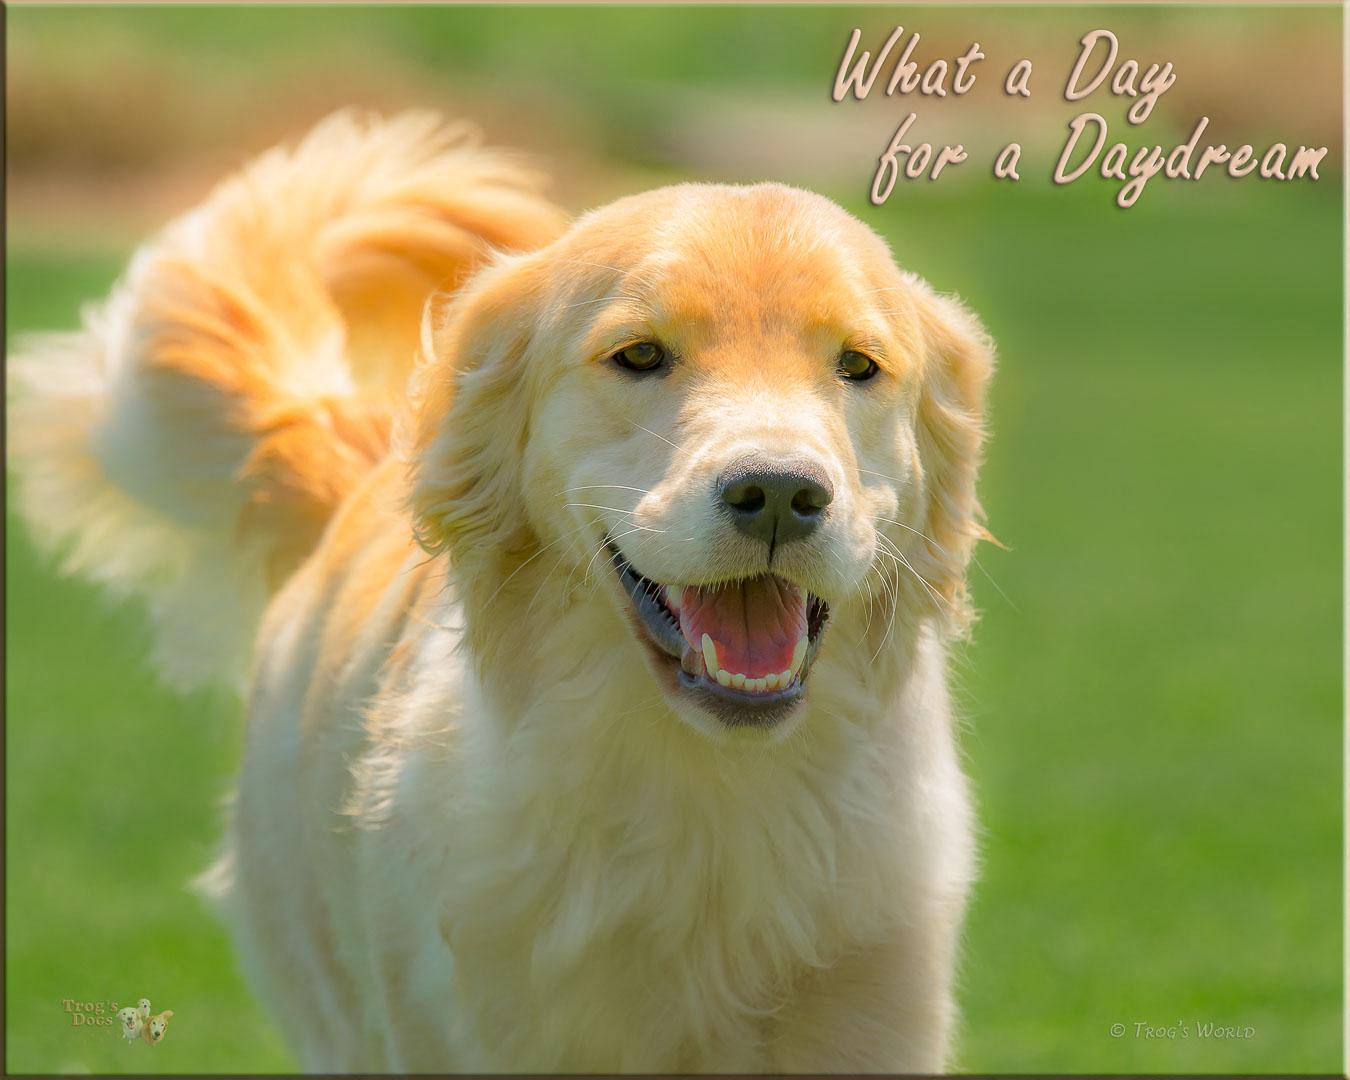 Golden Retriever smiling on a spring day